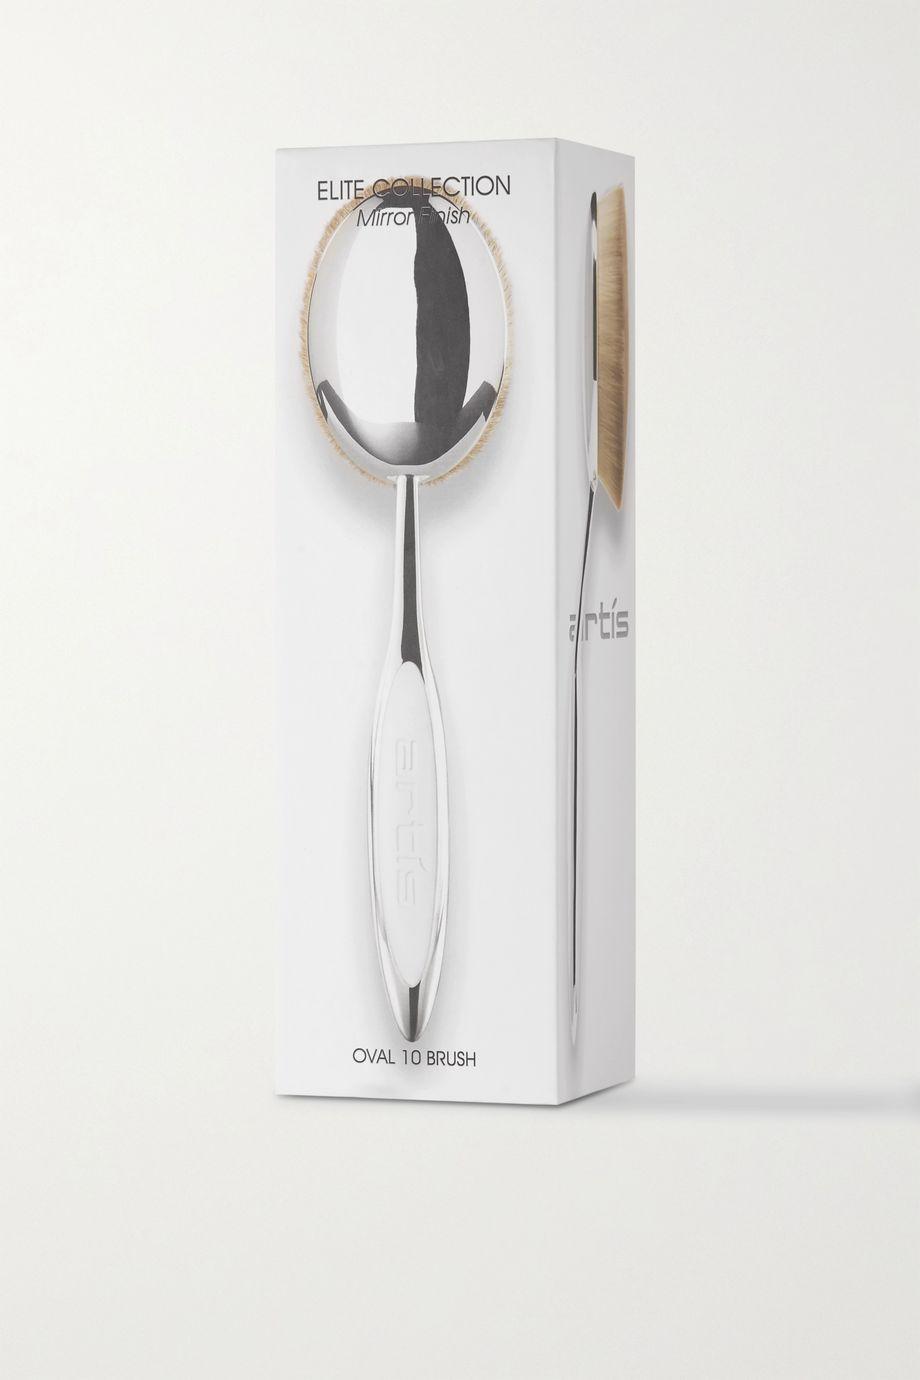 Artis Brush Next Generation Elite Mirror Oval 10 Brush